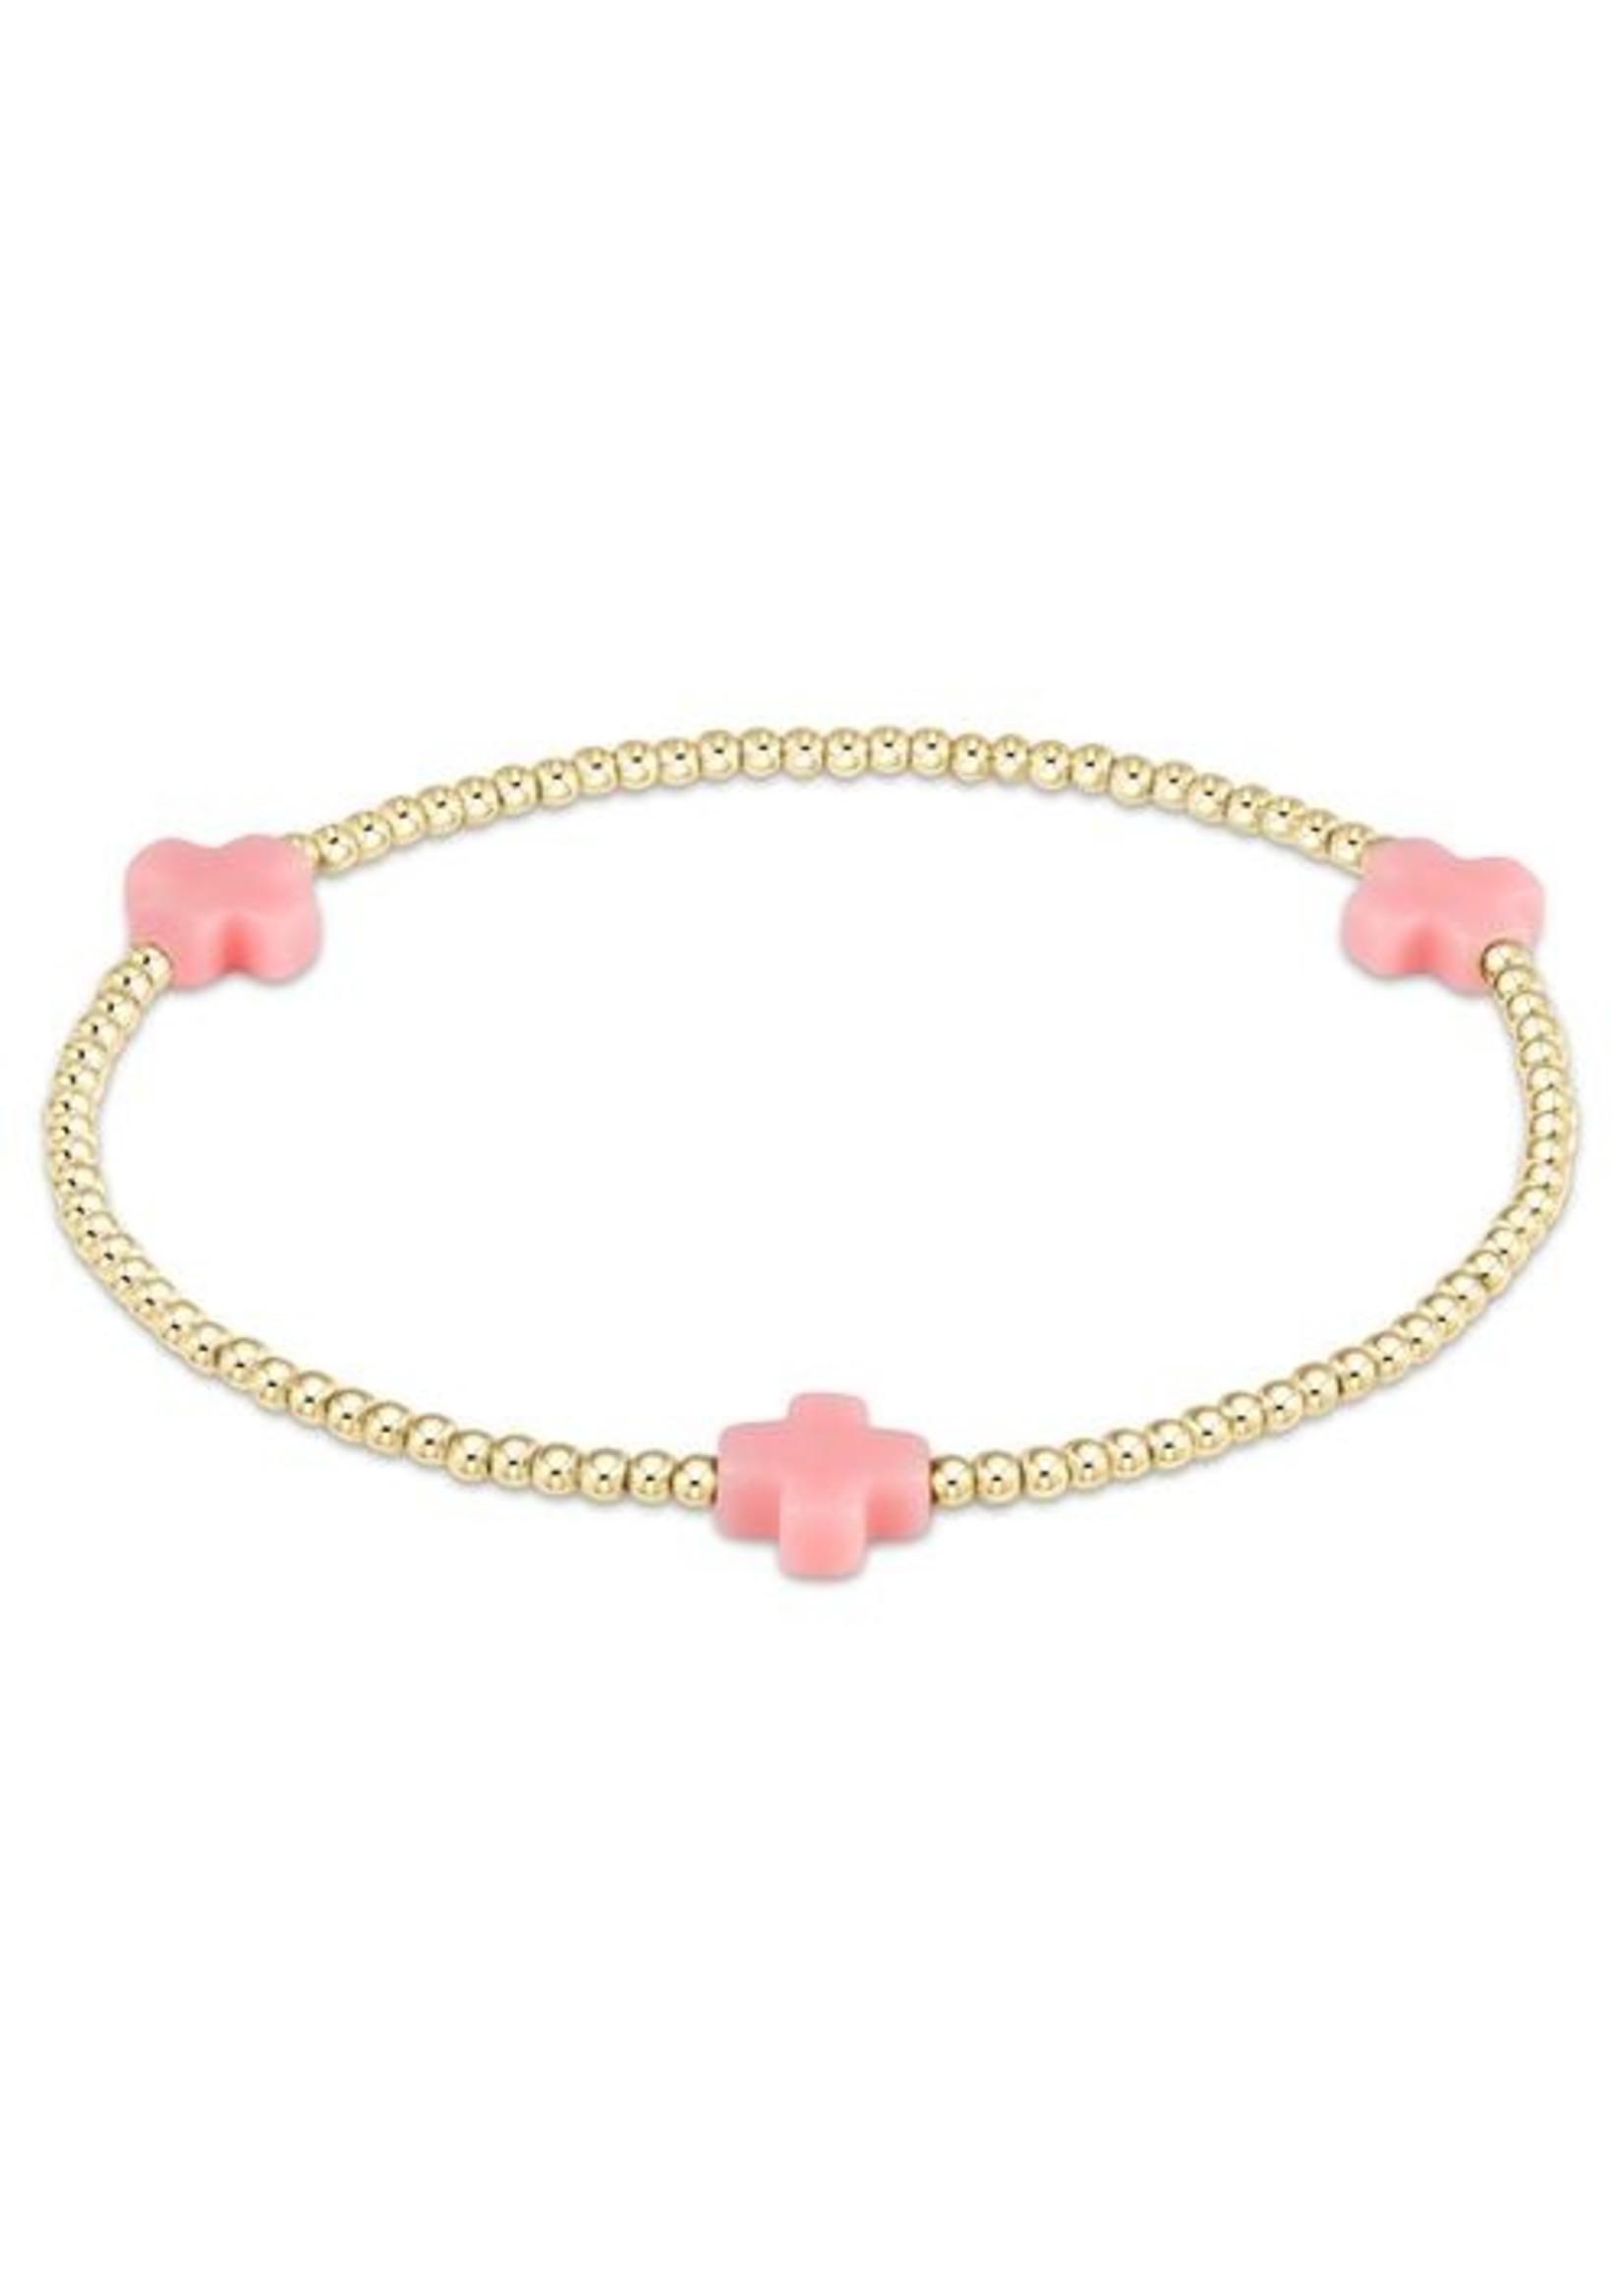 enewton Signature Cross Gold Pattern 3mm Bead Bracelet - Pink